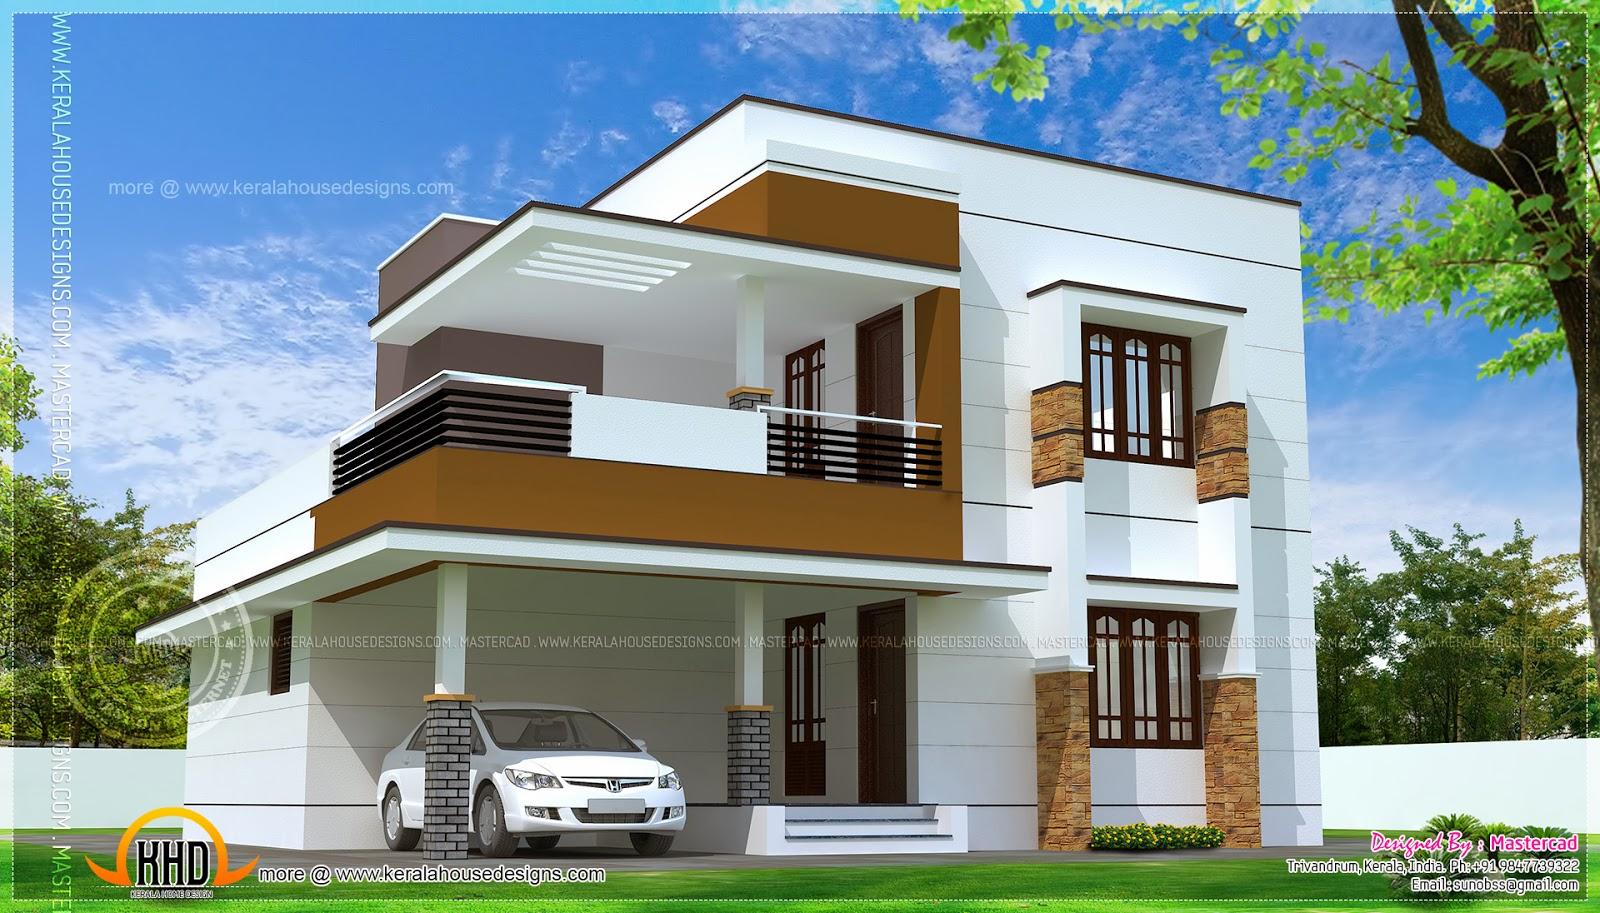 simple modern home design square feet kerala home design september kerala home design floor plans